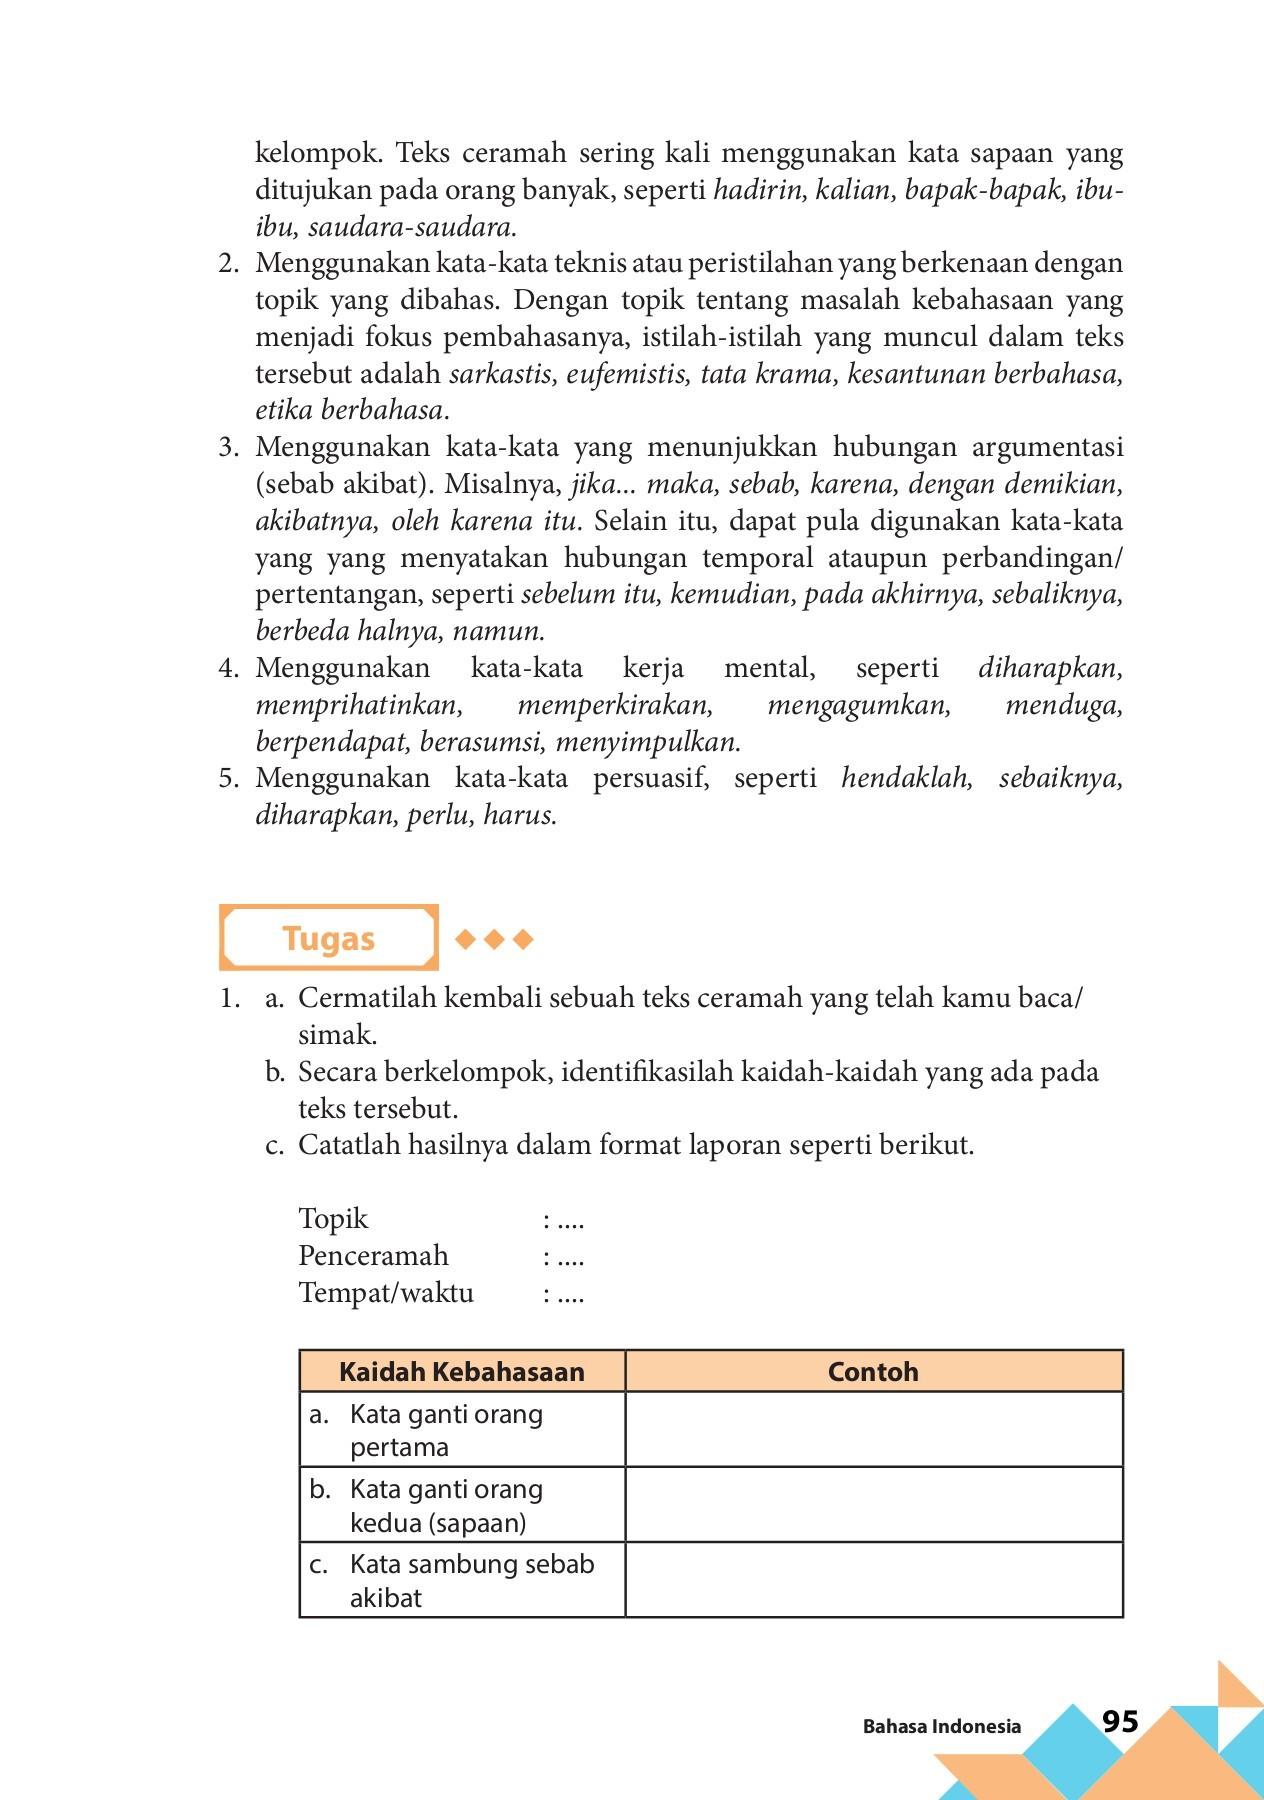 Bahasa Indonesia Kelas 11 By Sartono Flip Book Pages 101 150 Pubhtml5